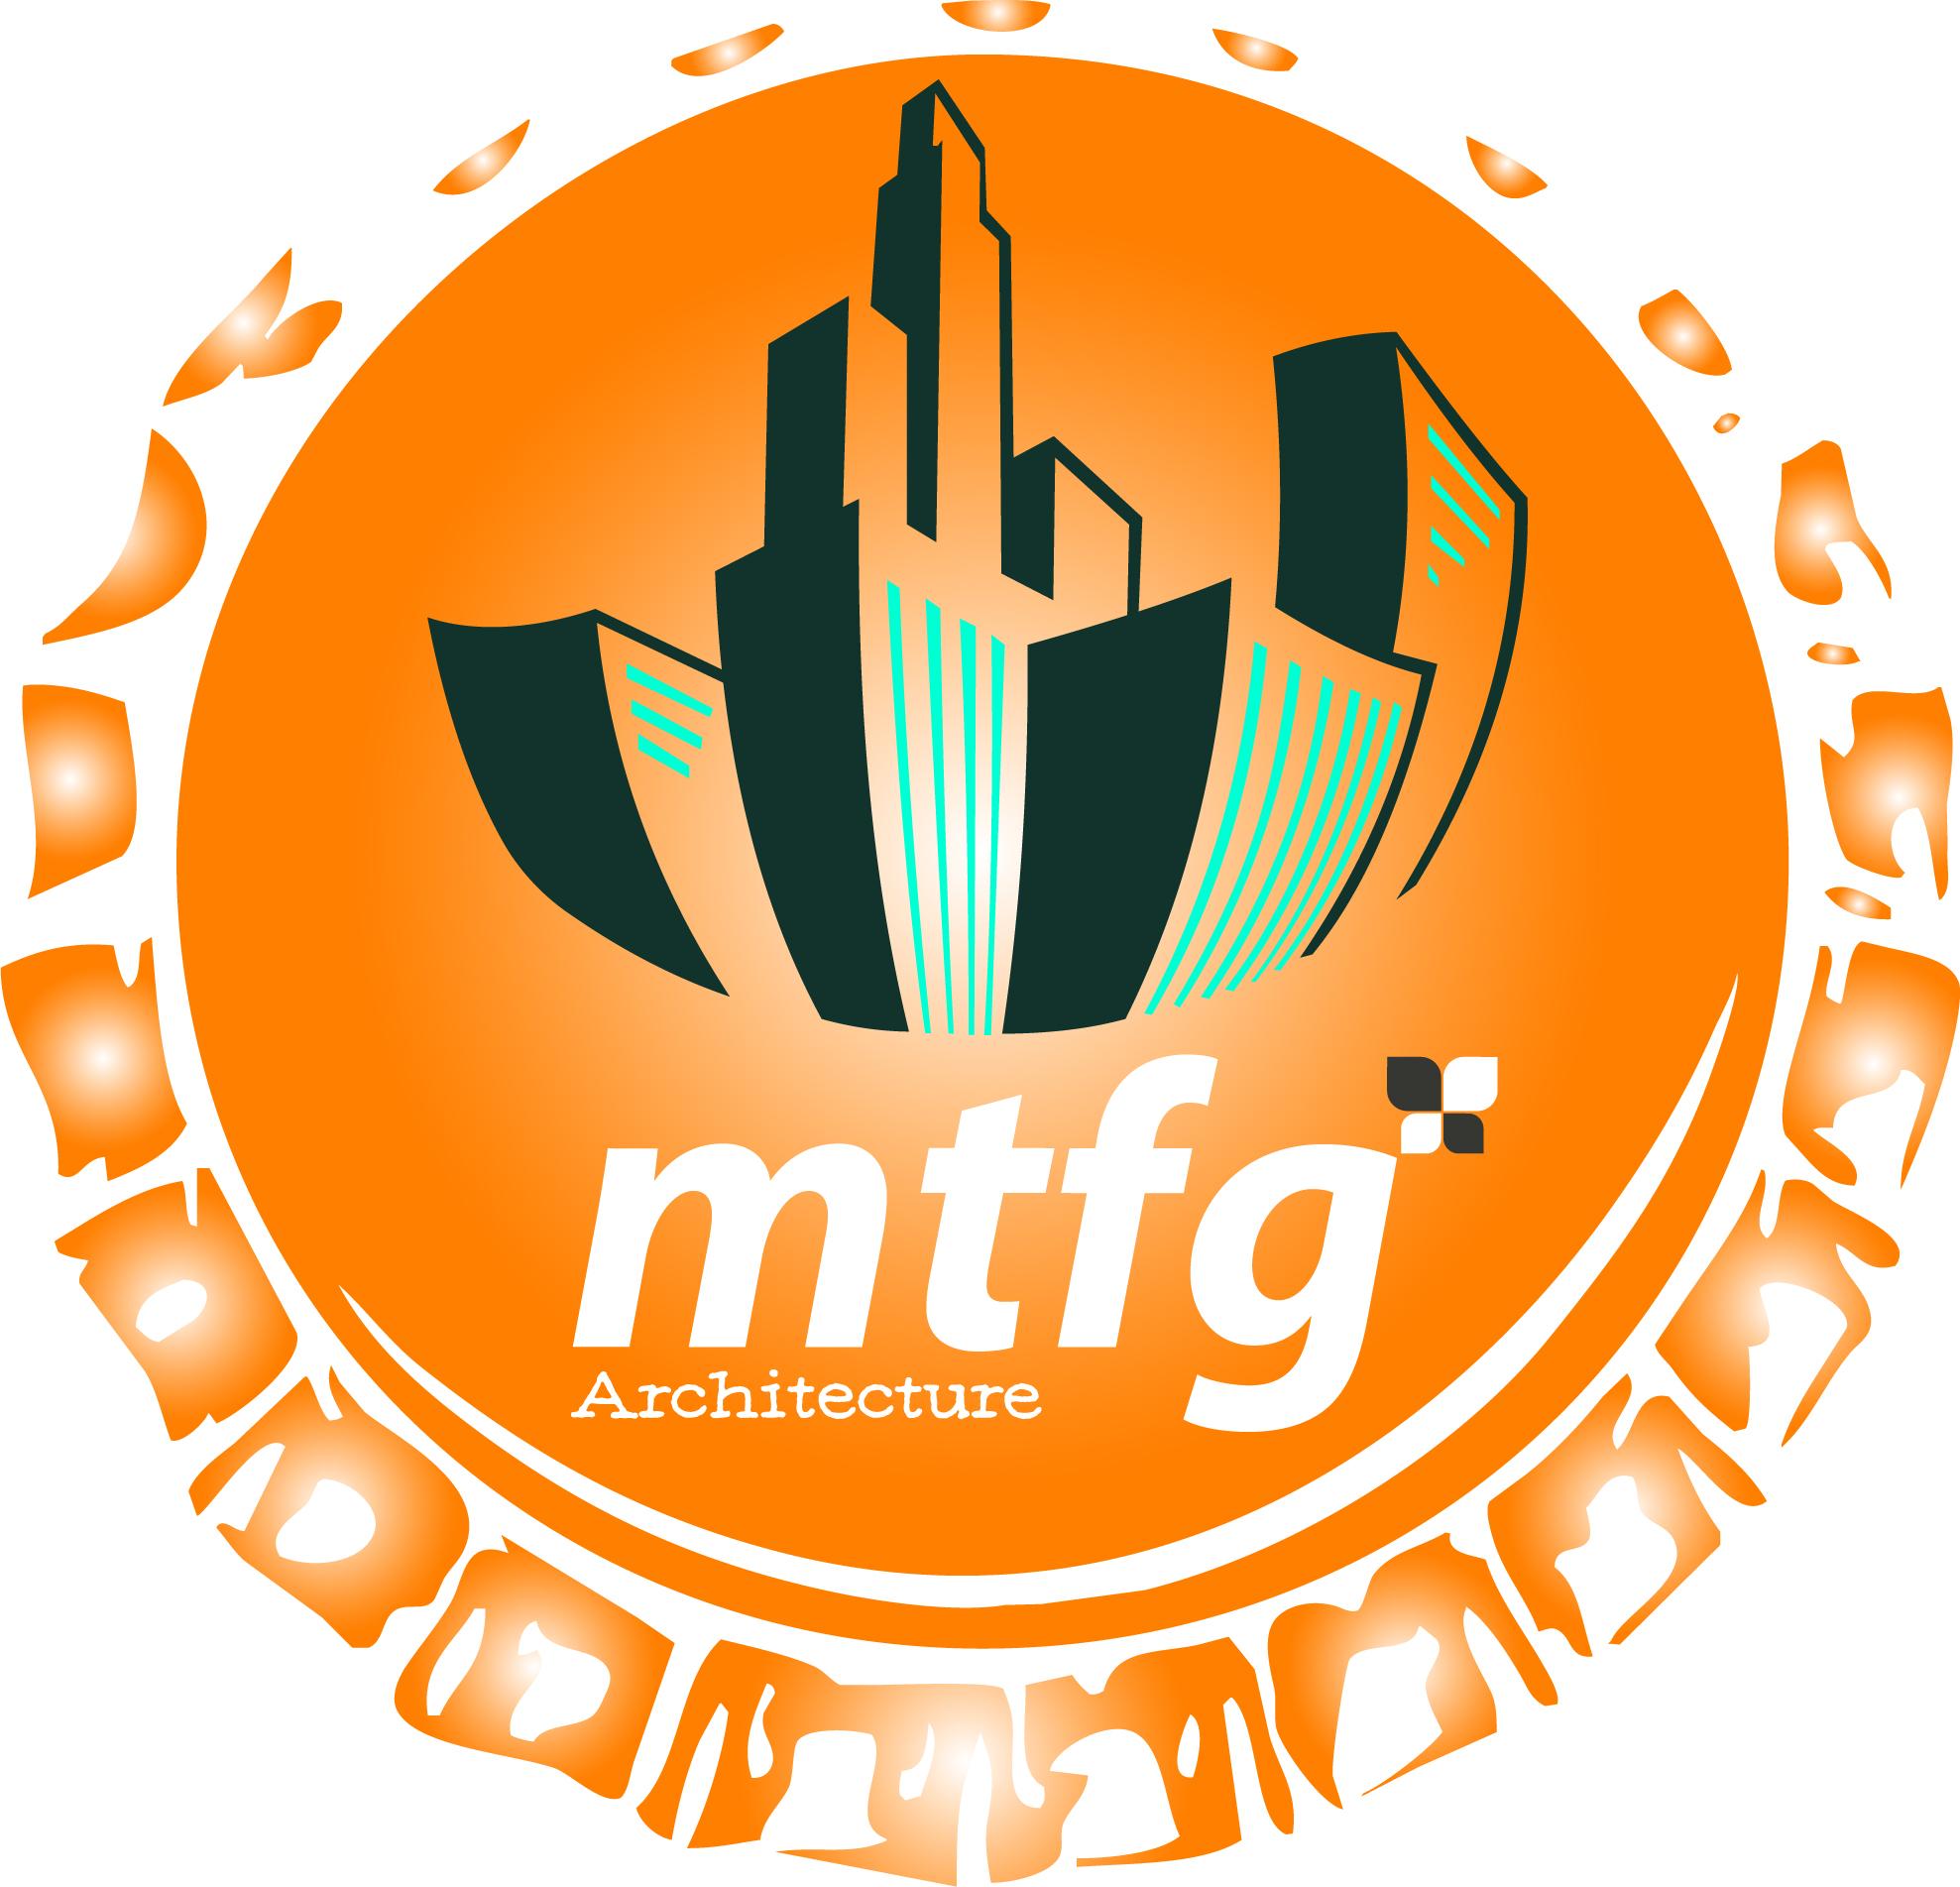 MTFG Architecture